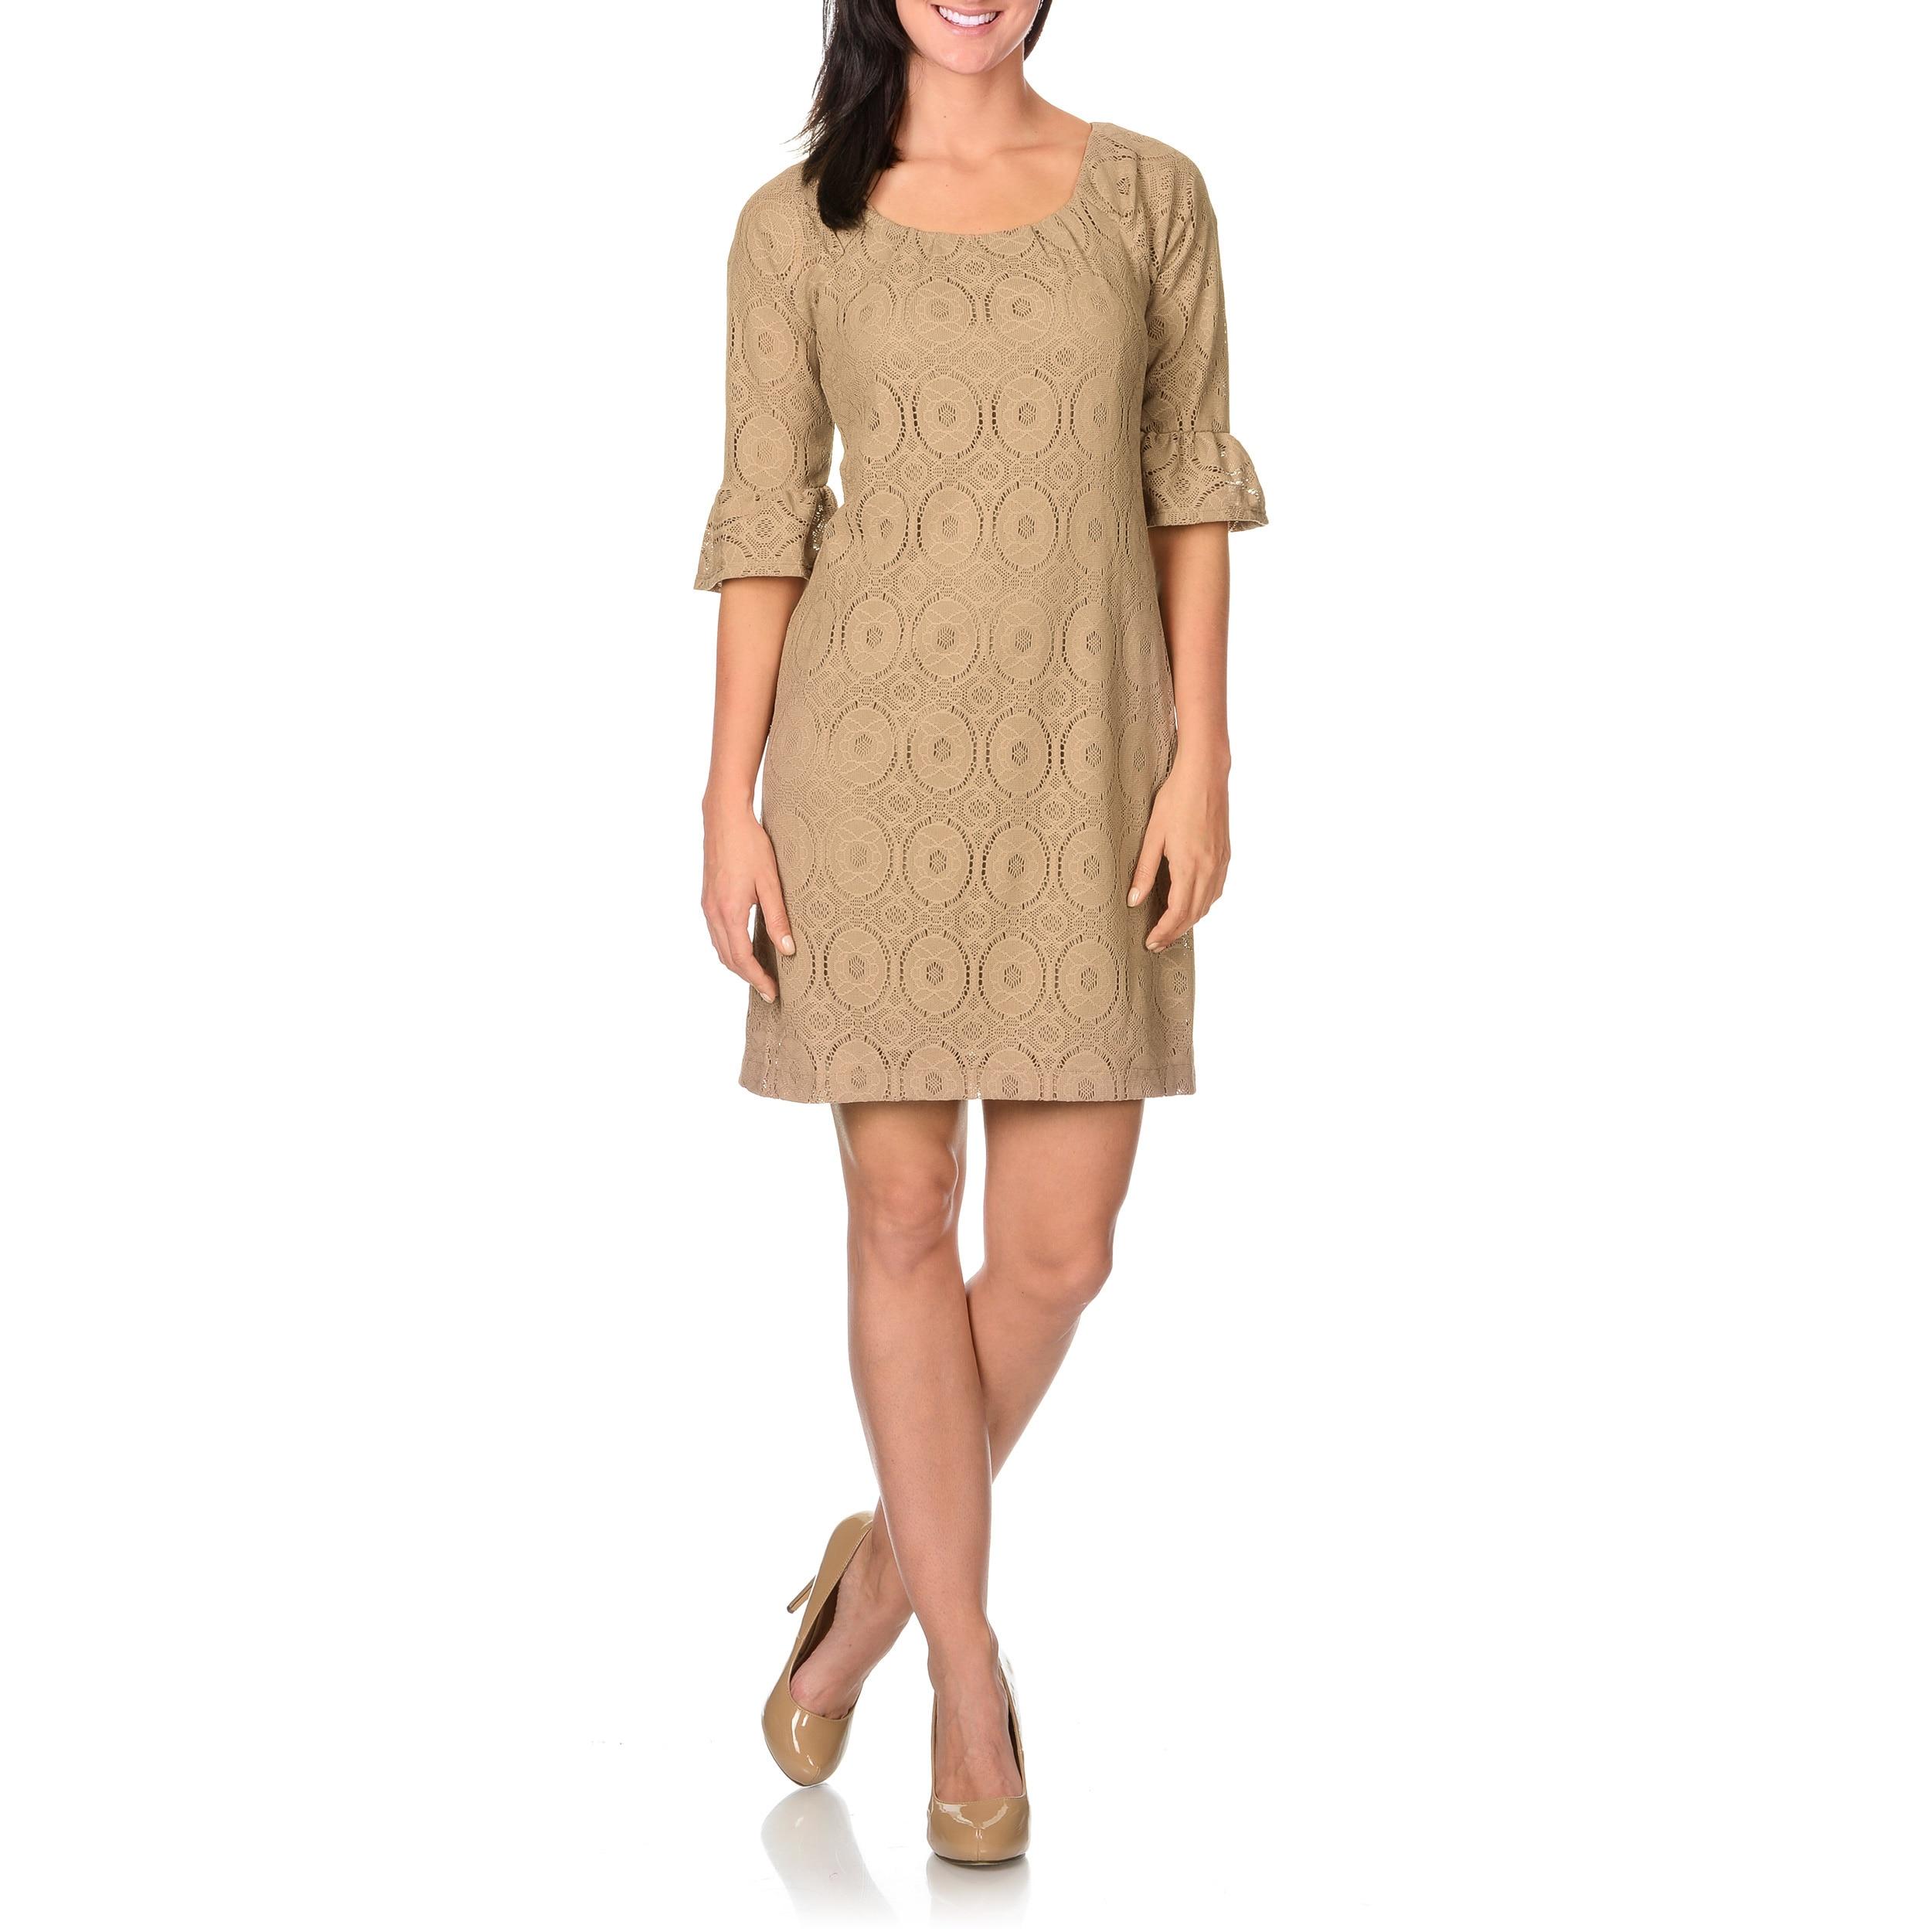 Overstock.com Rabbit Rabbit Rabbit Designs Women's Camel Lace Dress at Sears.com